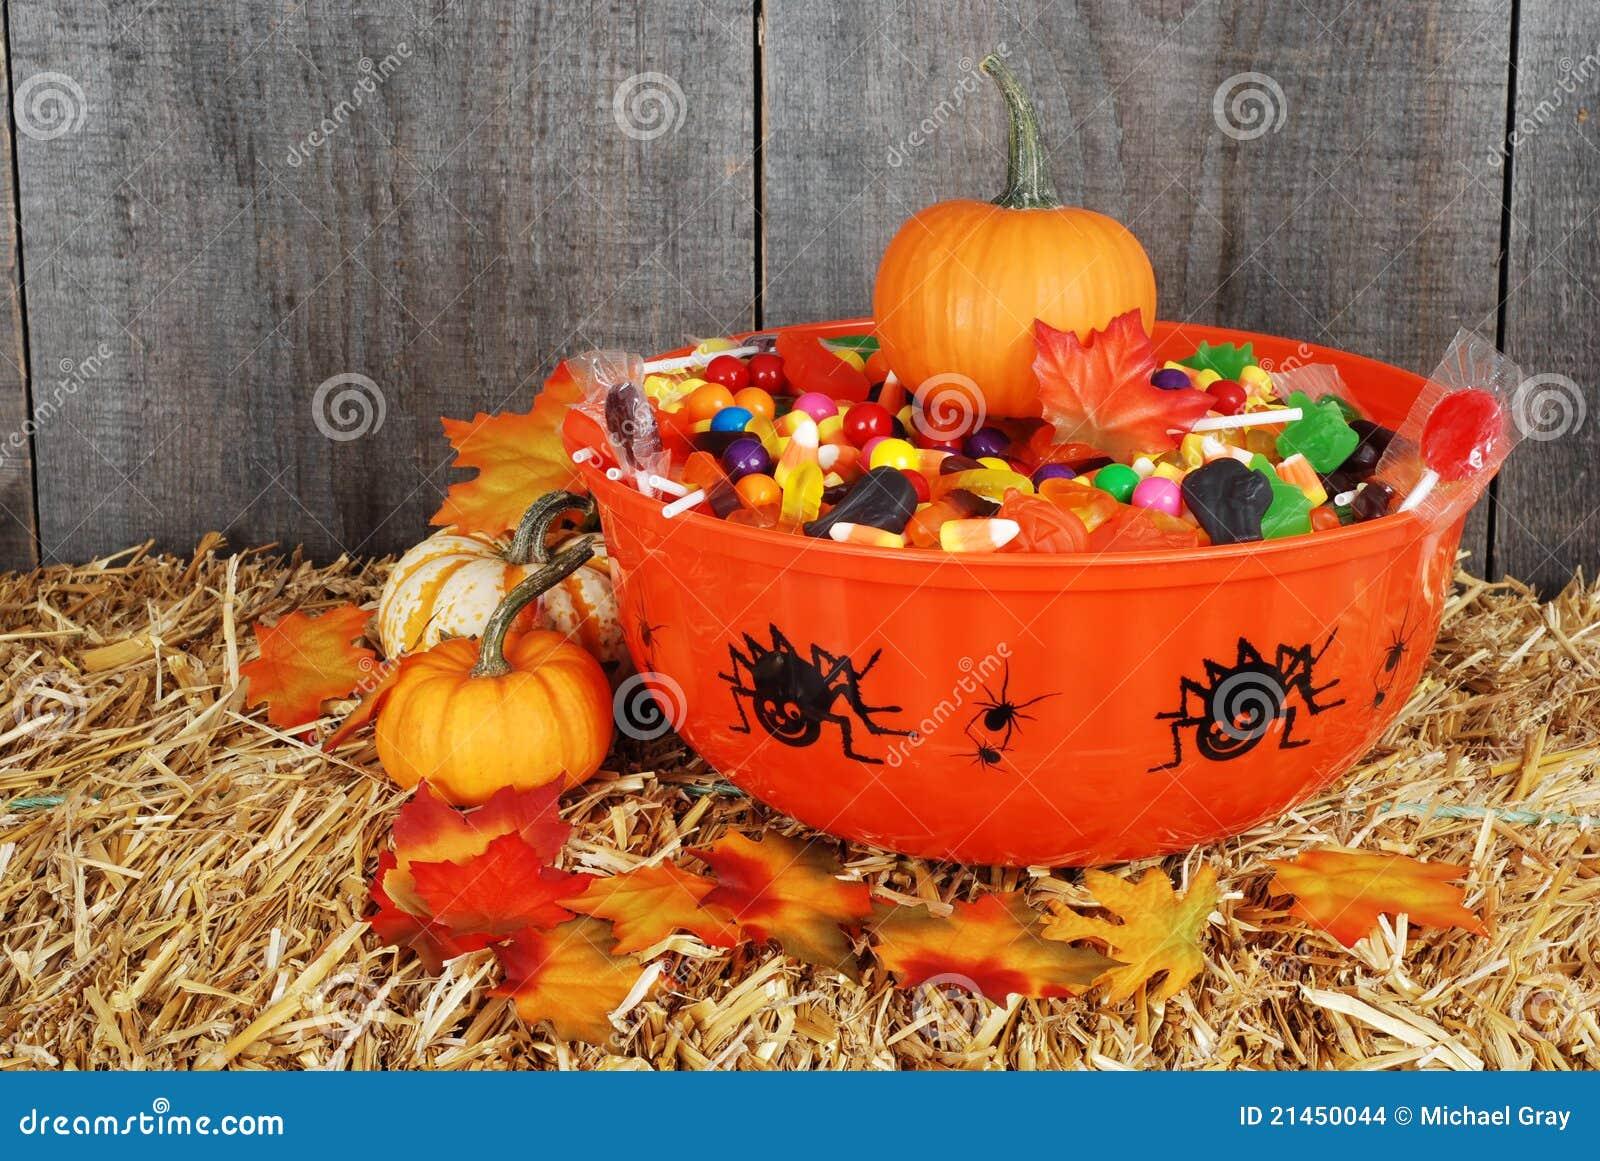 Gumball Halloween